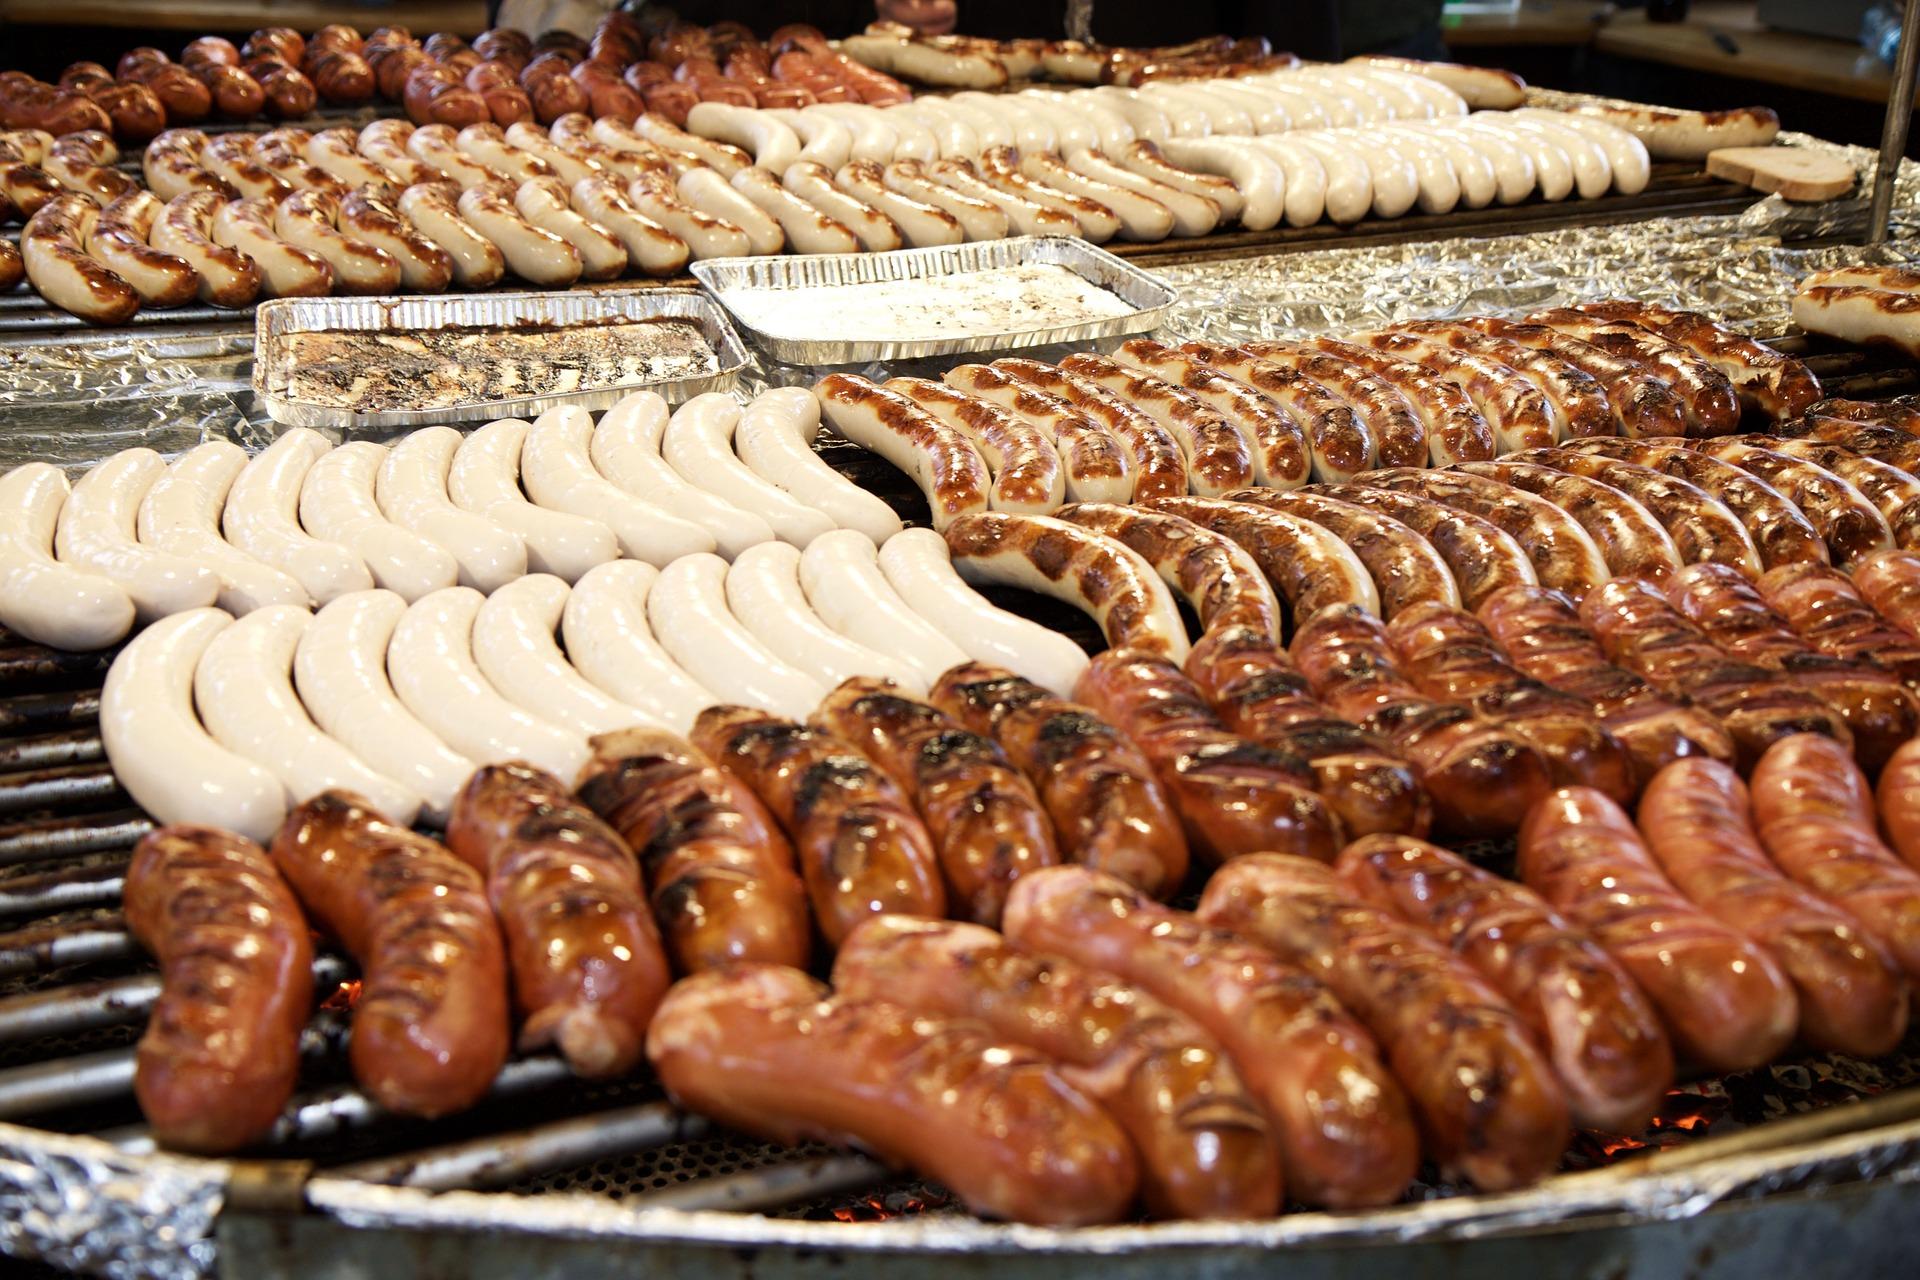 sausages-1080138_1920